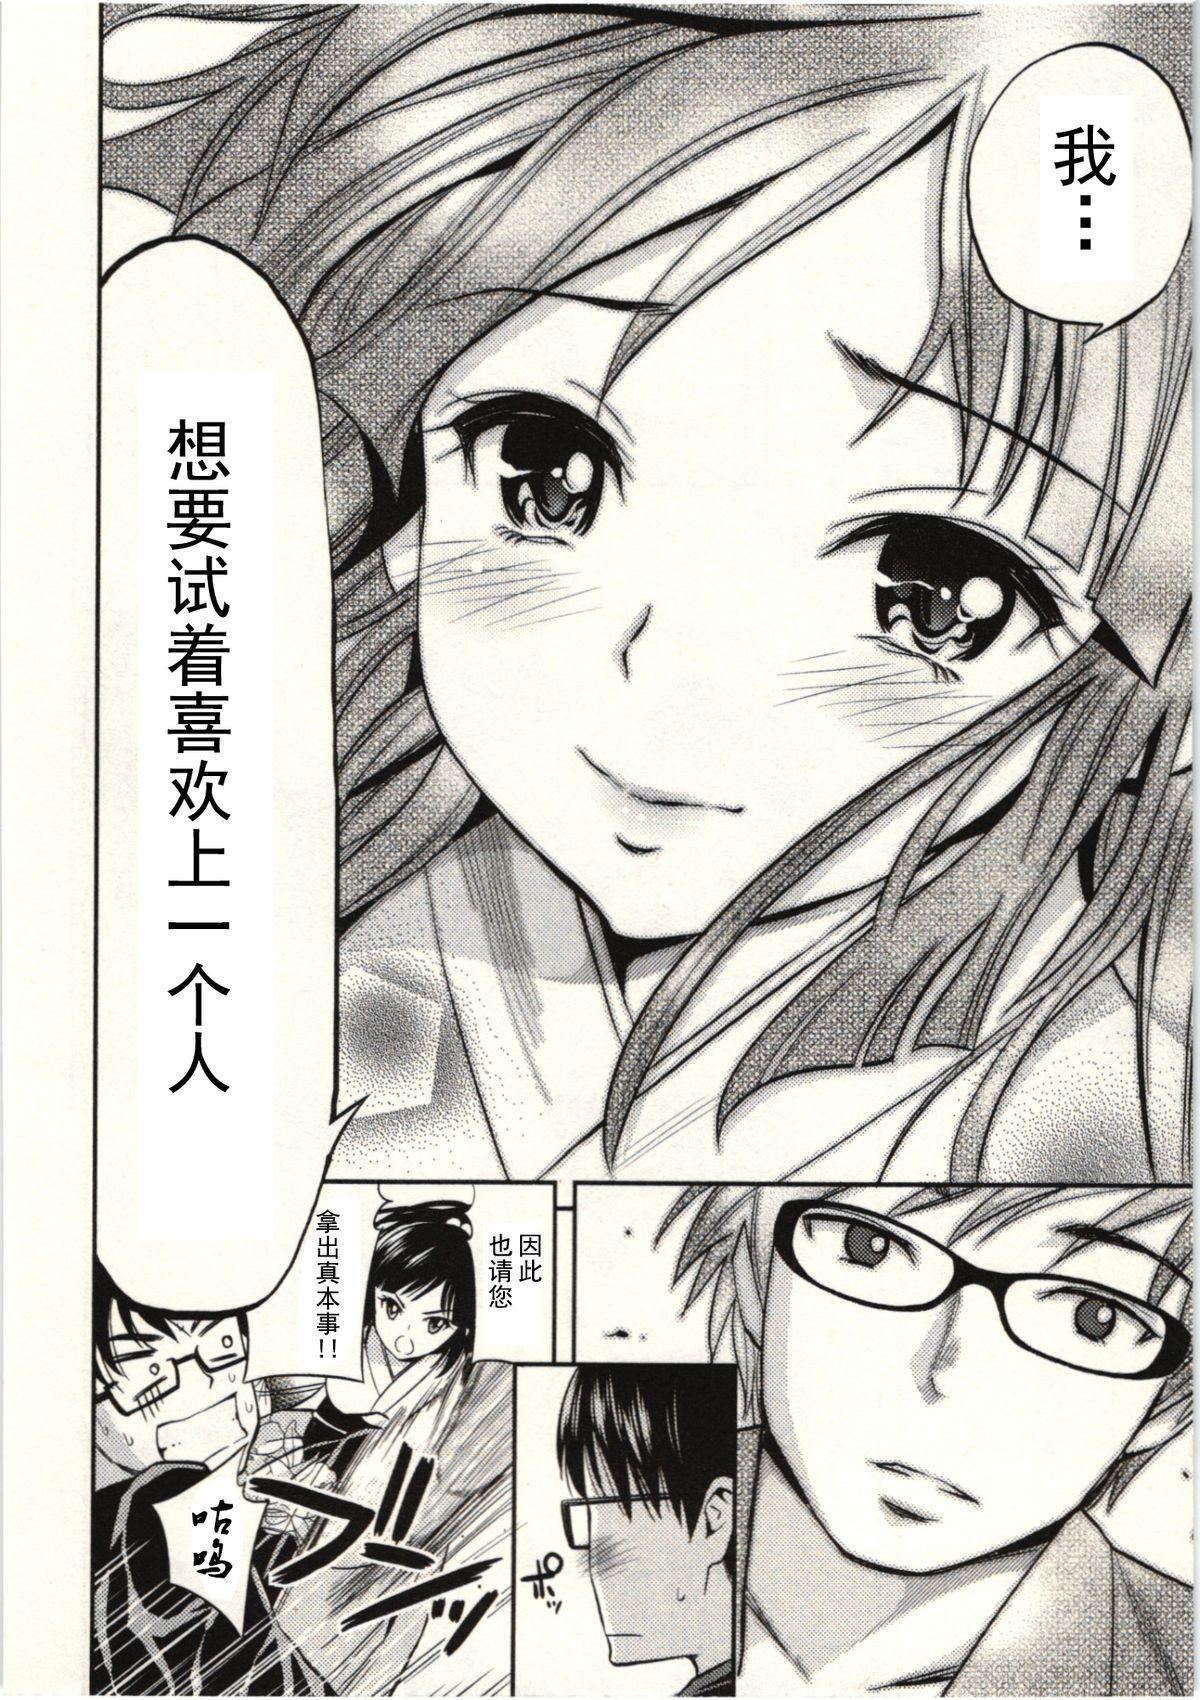 Tadashii Majutsu no Asobikata - The right way of playing of magic. 112